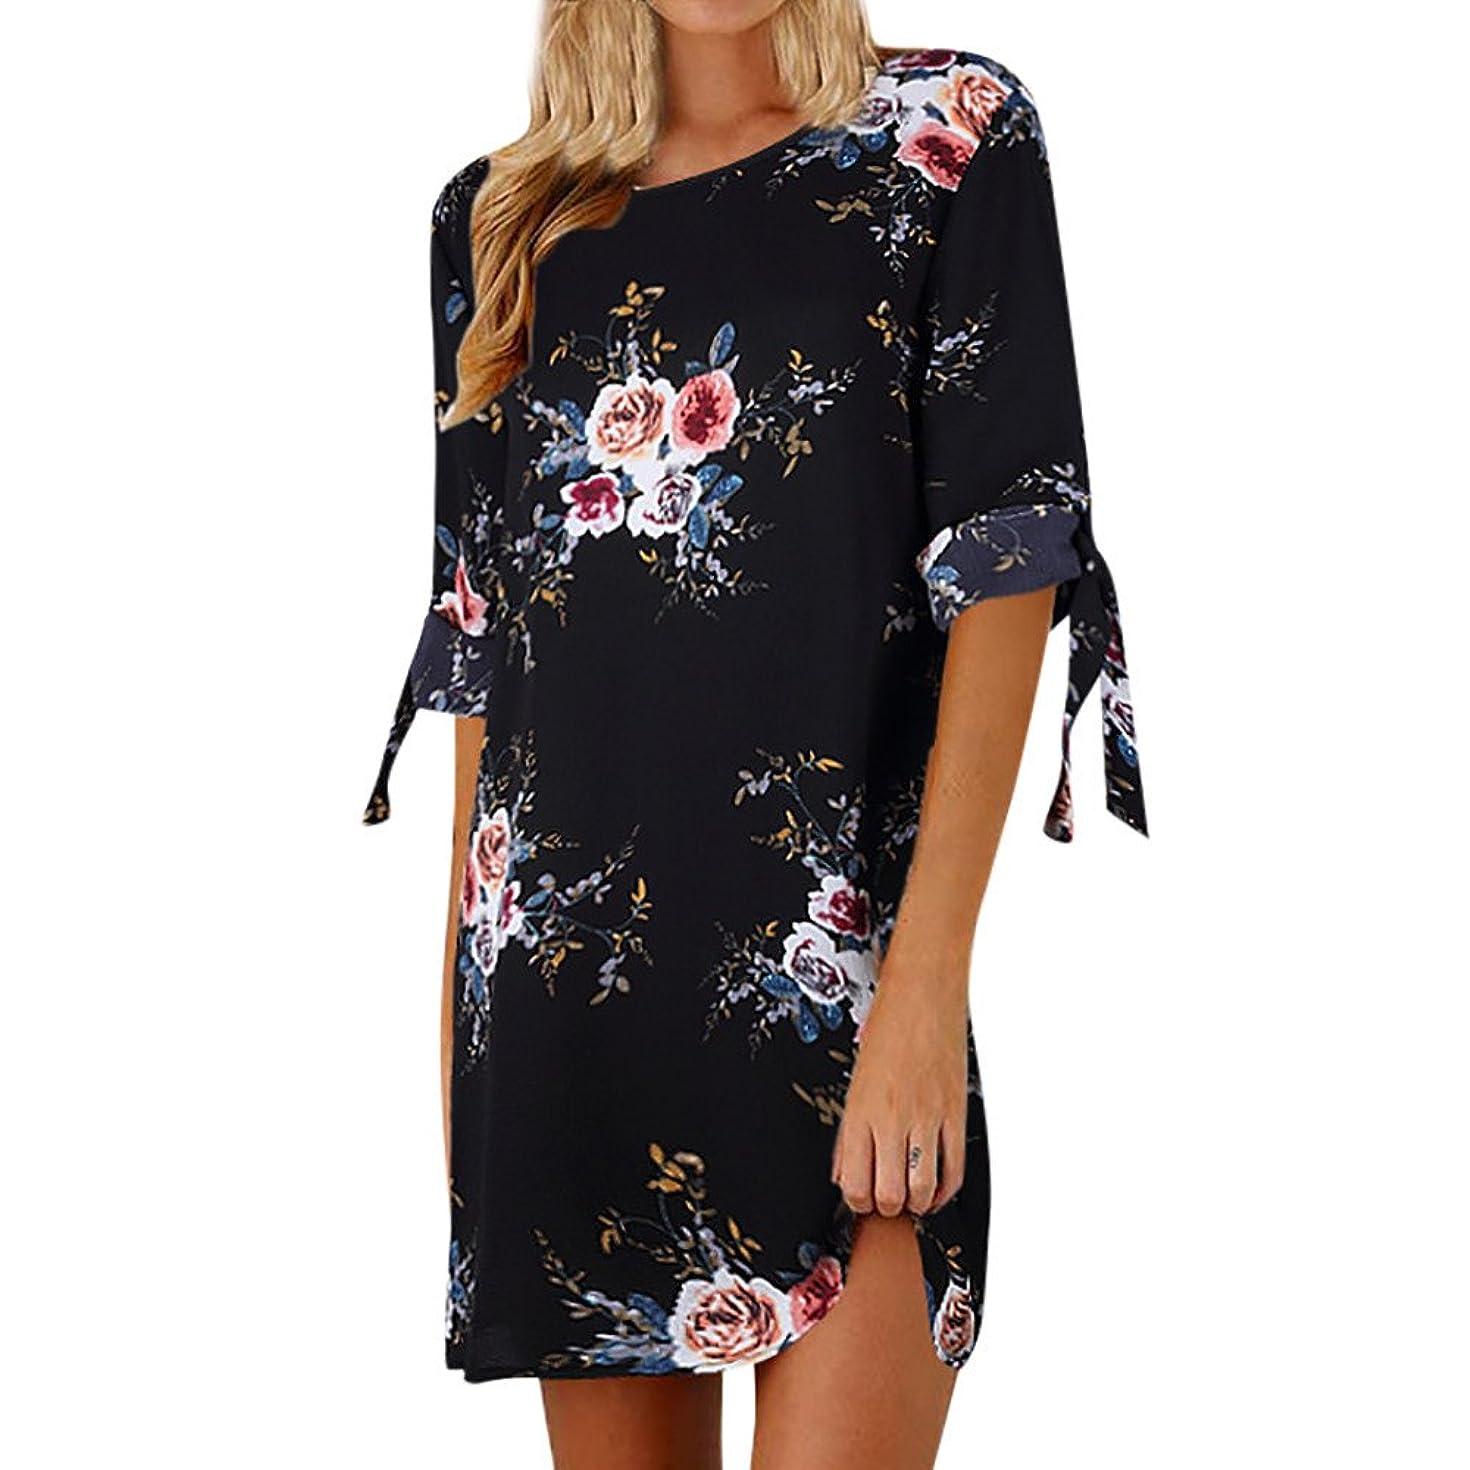 BingYELH Women Floral Print Self-tie Sleeve Tunic Shift A Line Shirt Dress Mini Summer Chiffon Casual Dress